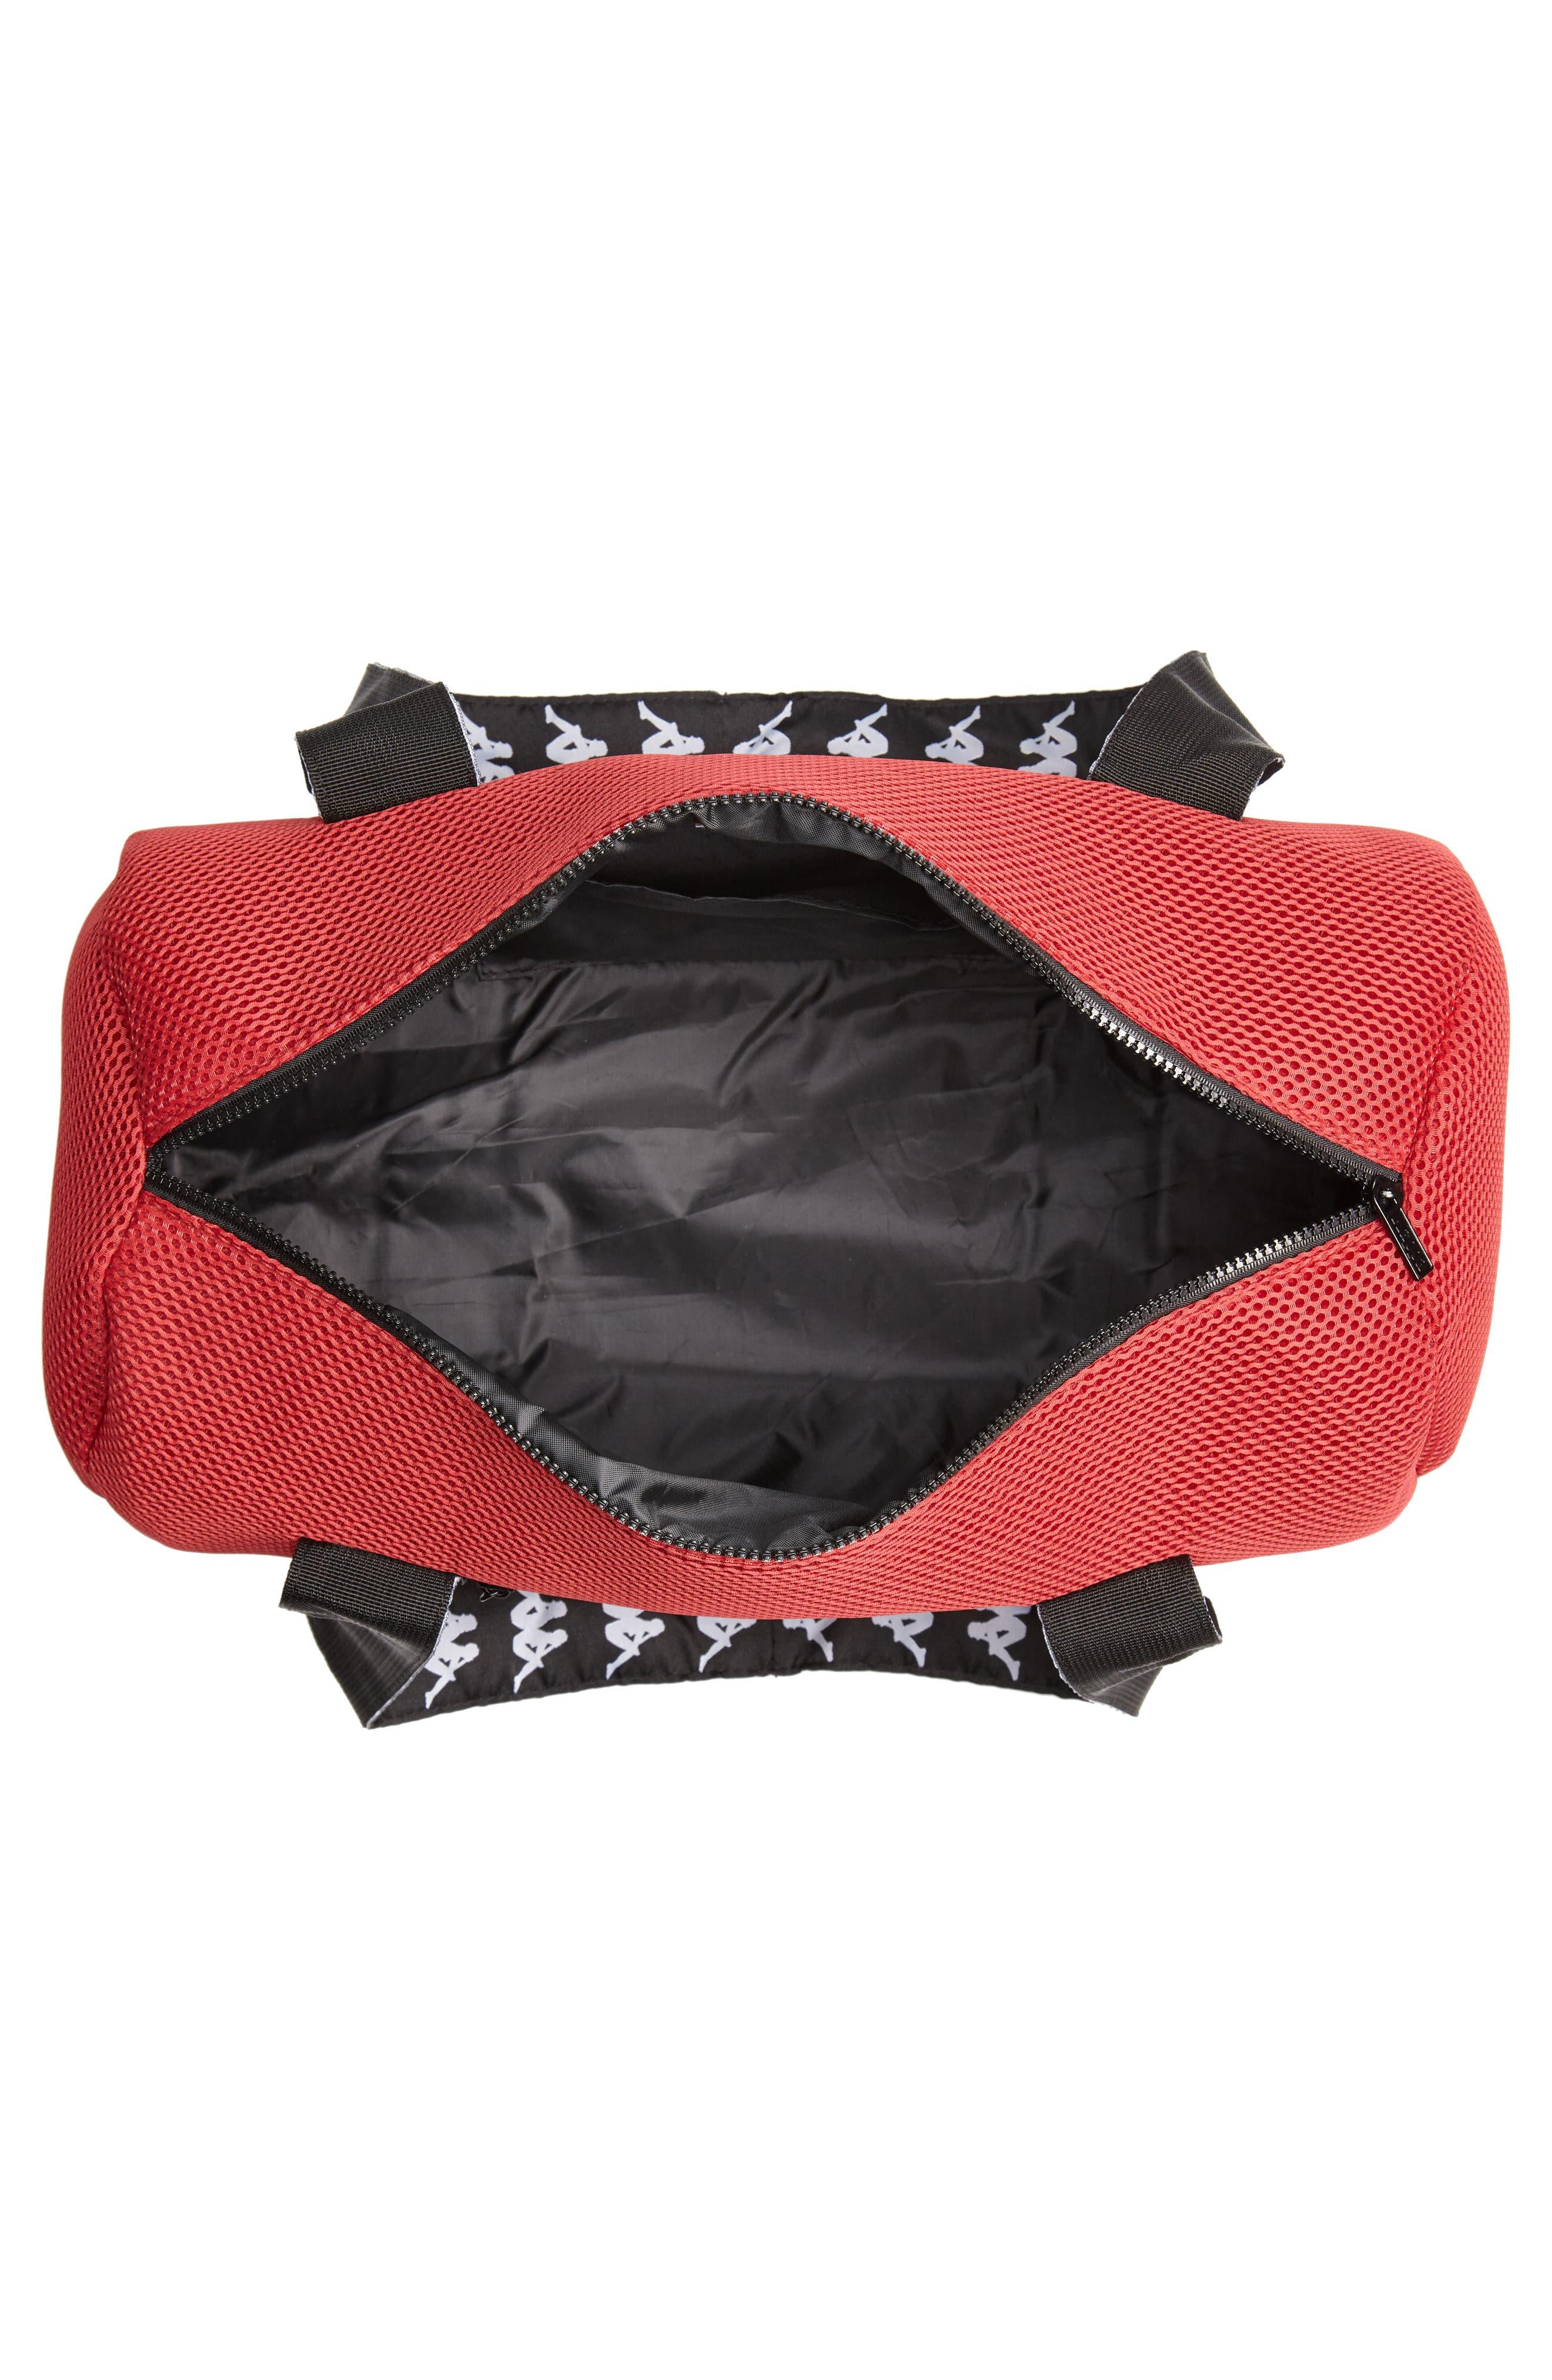 Large Mesh Athletic Duffel Bag,                             Alternate thumbnail 4, color,                             RED DK-BLACK-WHITE